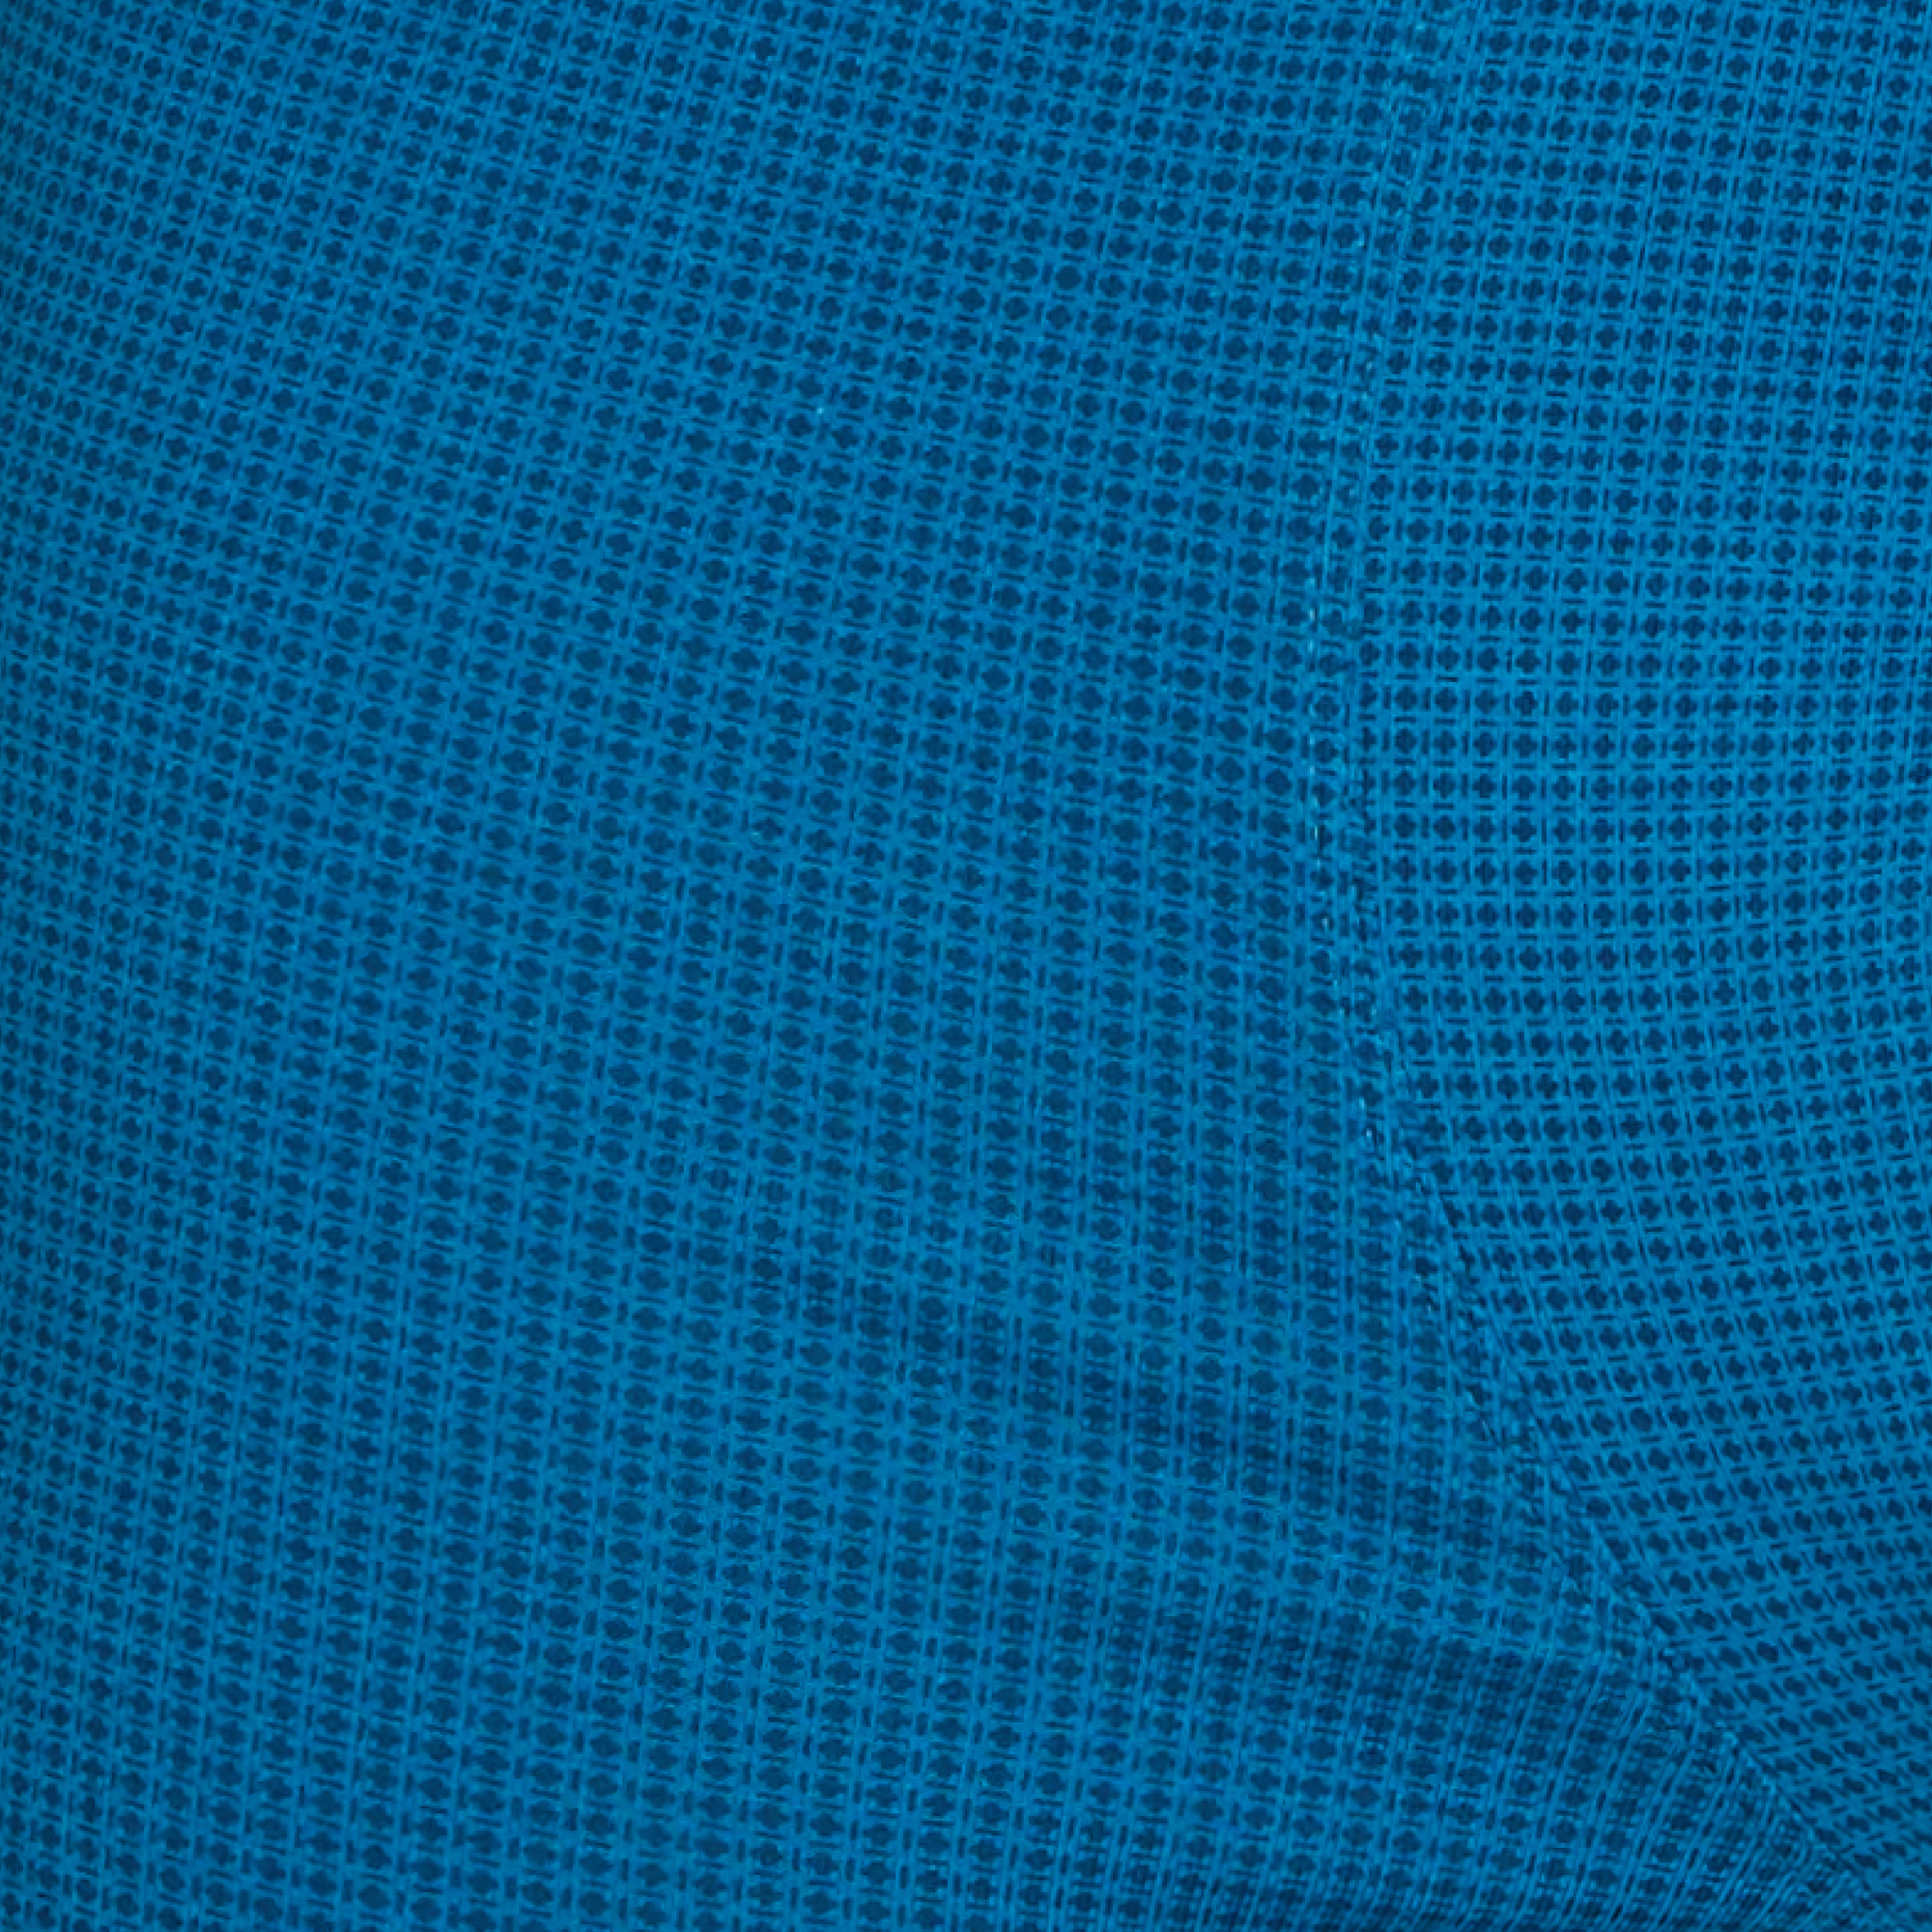 Трусы мужские шорты MH-1028